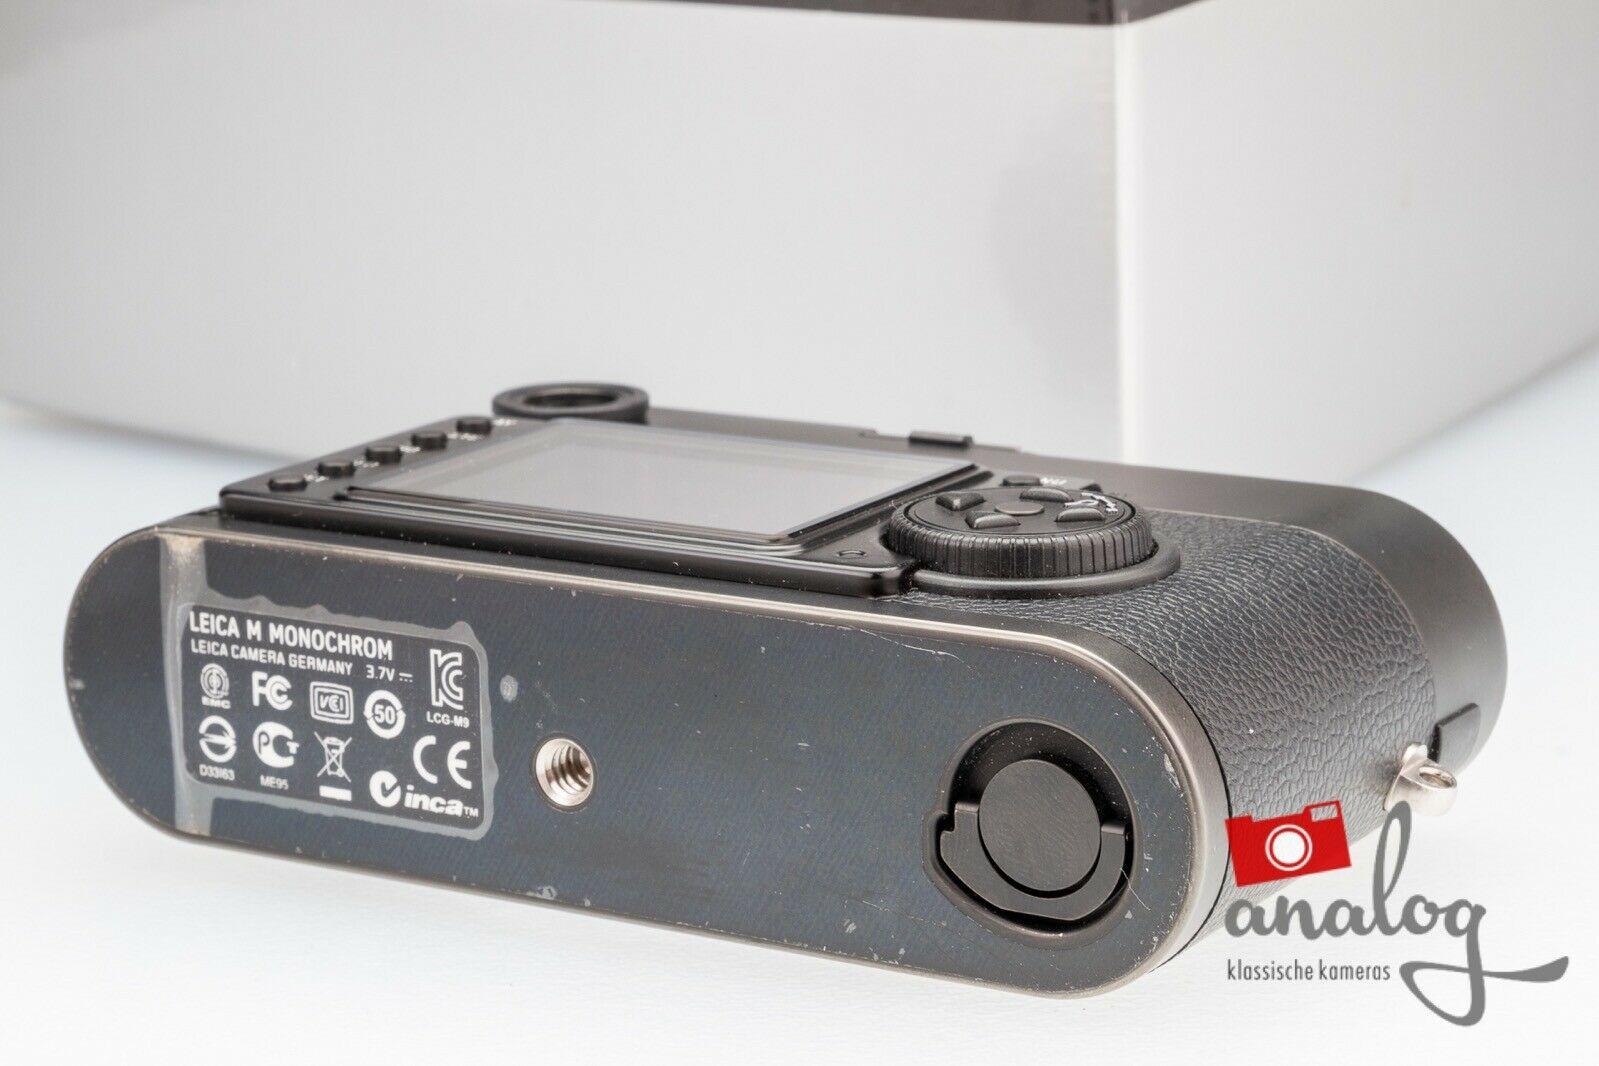 Leica M Monochrom CCD - 10760  Tauschsensor